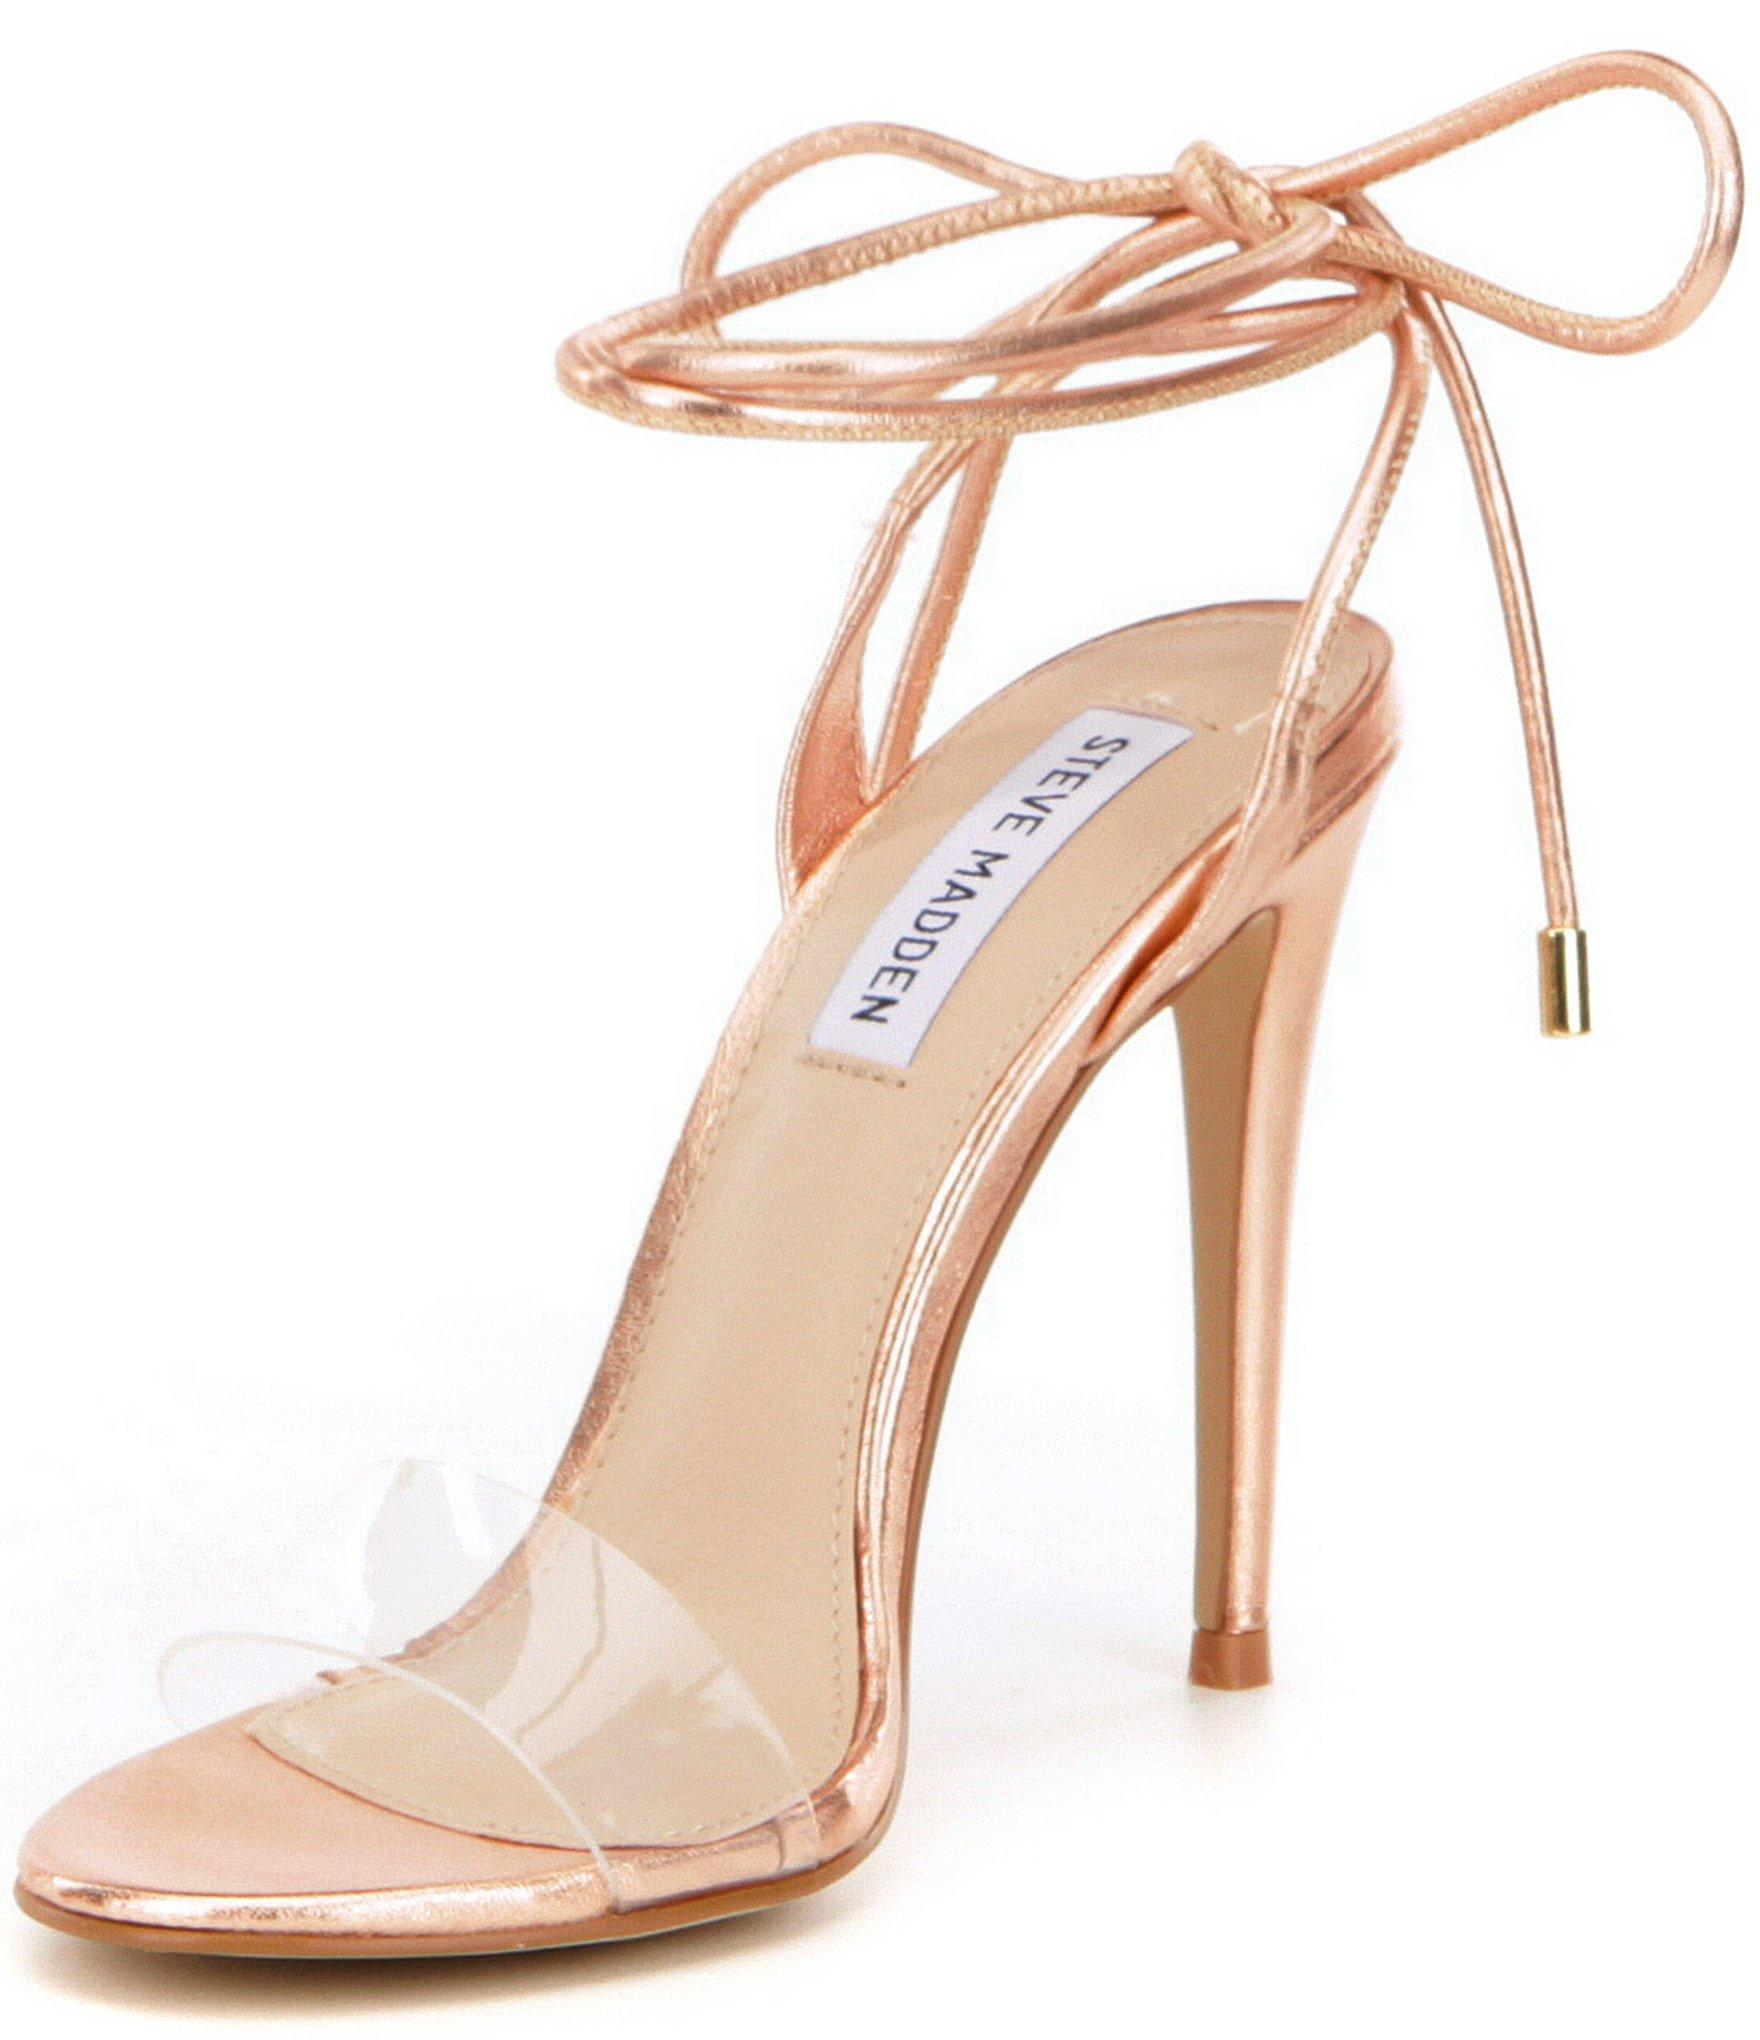 49fa6d9b2e4 Lyst - Steve Madden Lyla Ankle Tie Dress Sandals